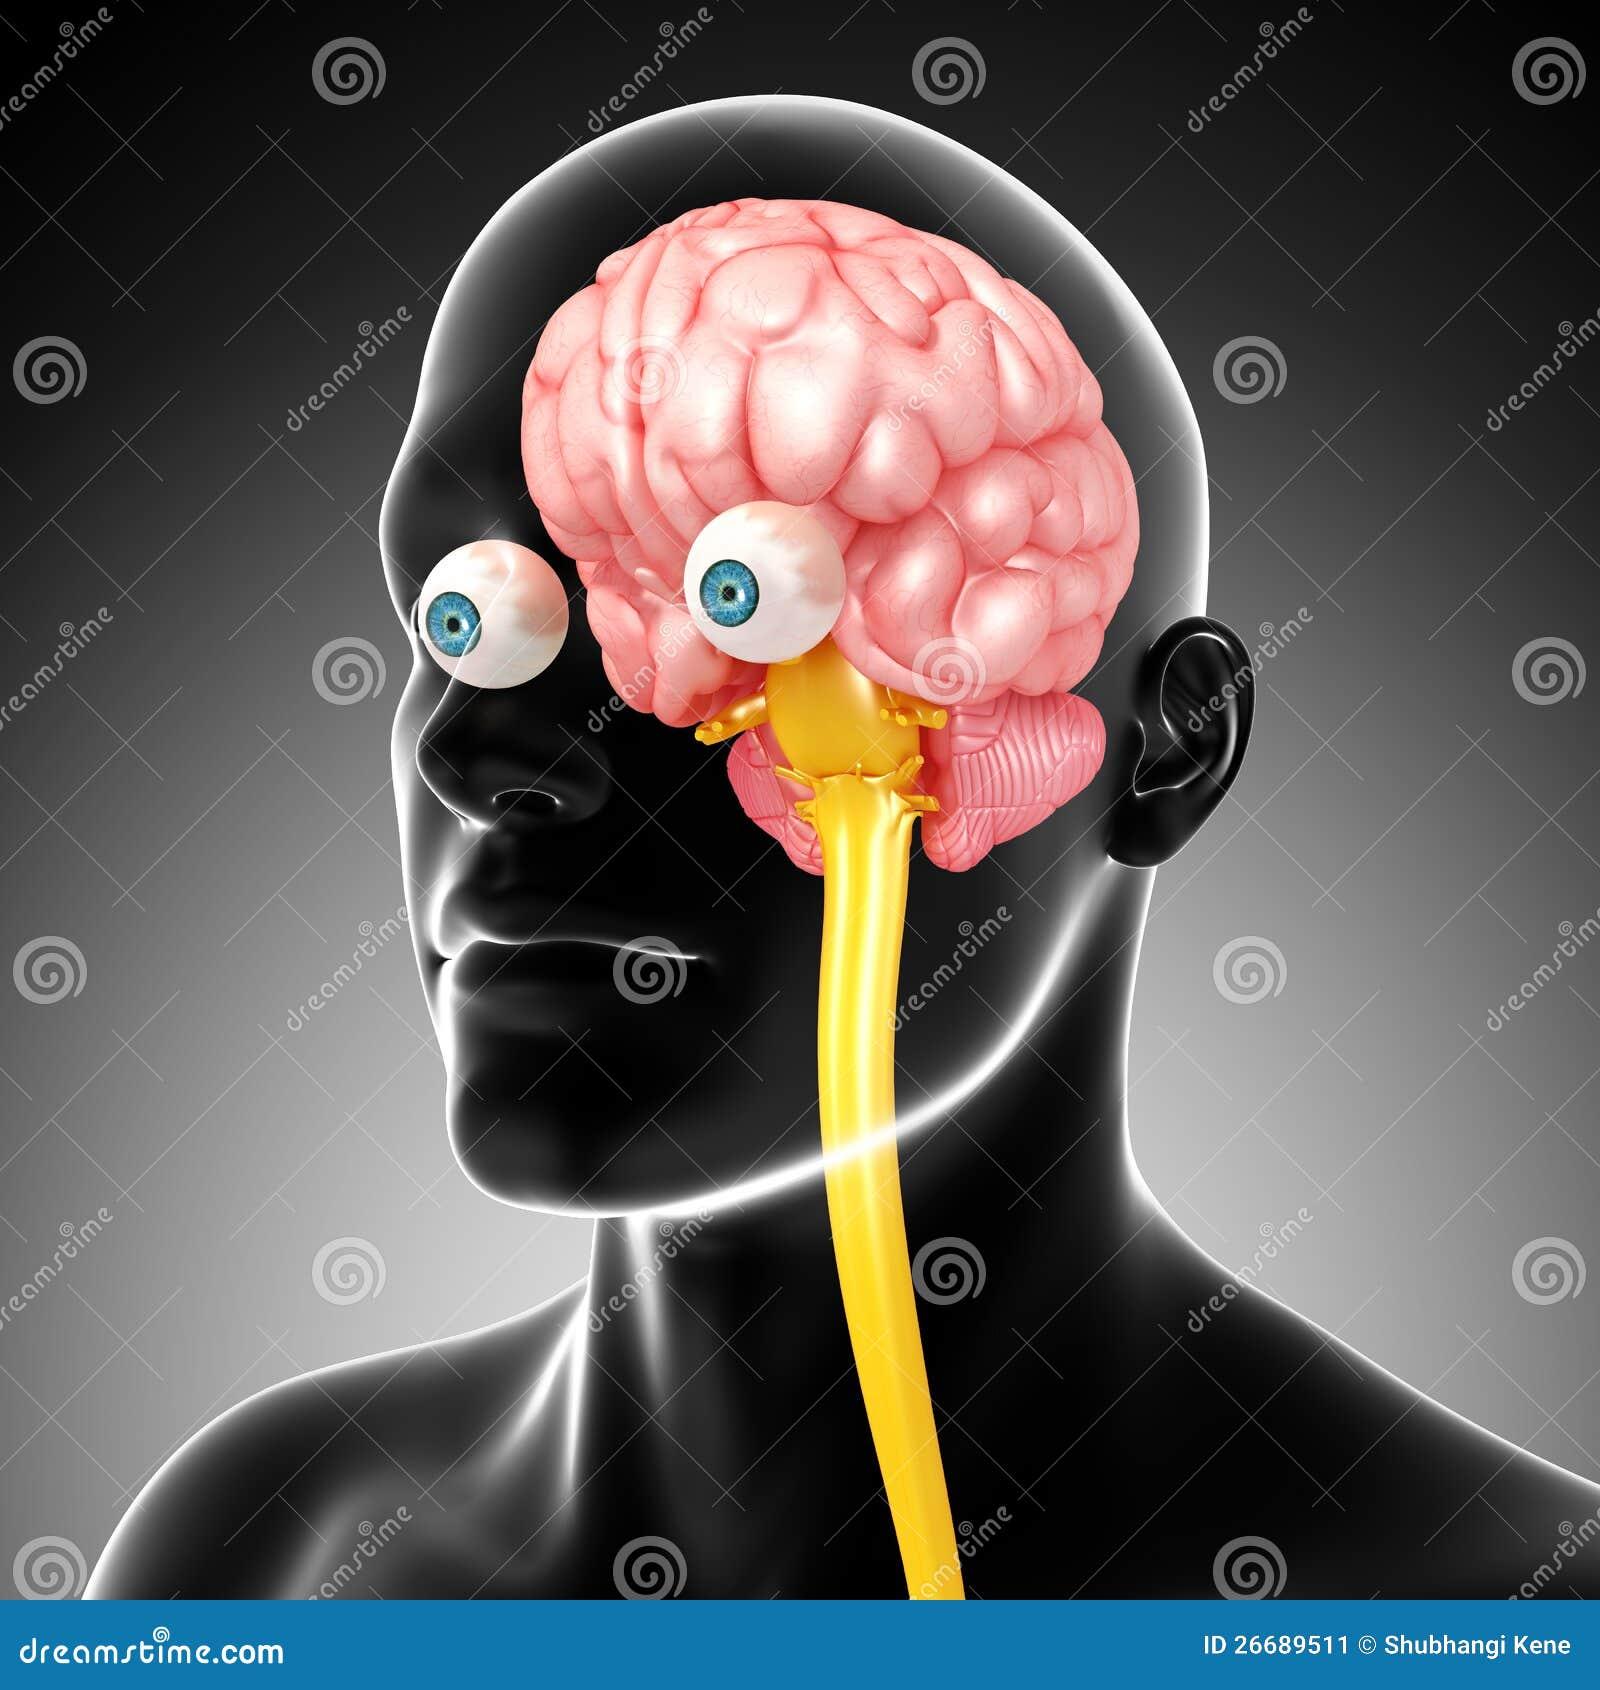 Anatomy Of Male Brain And Medulla Oblongata Stock Illustration